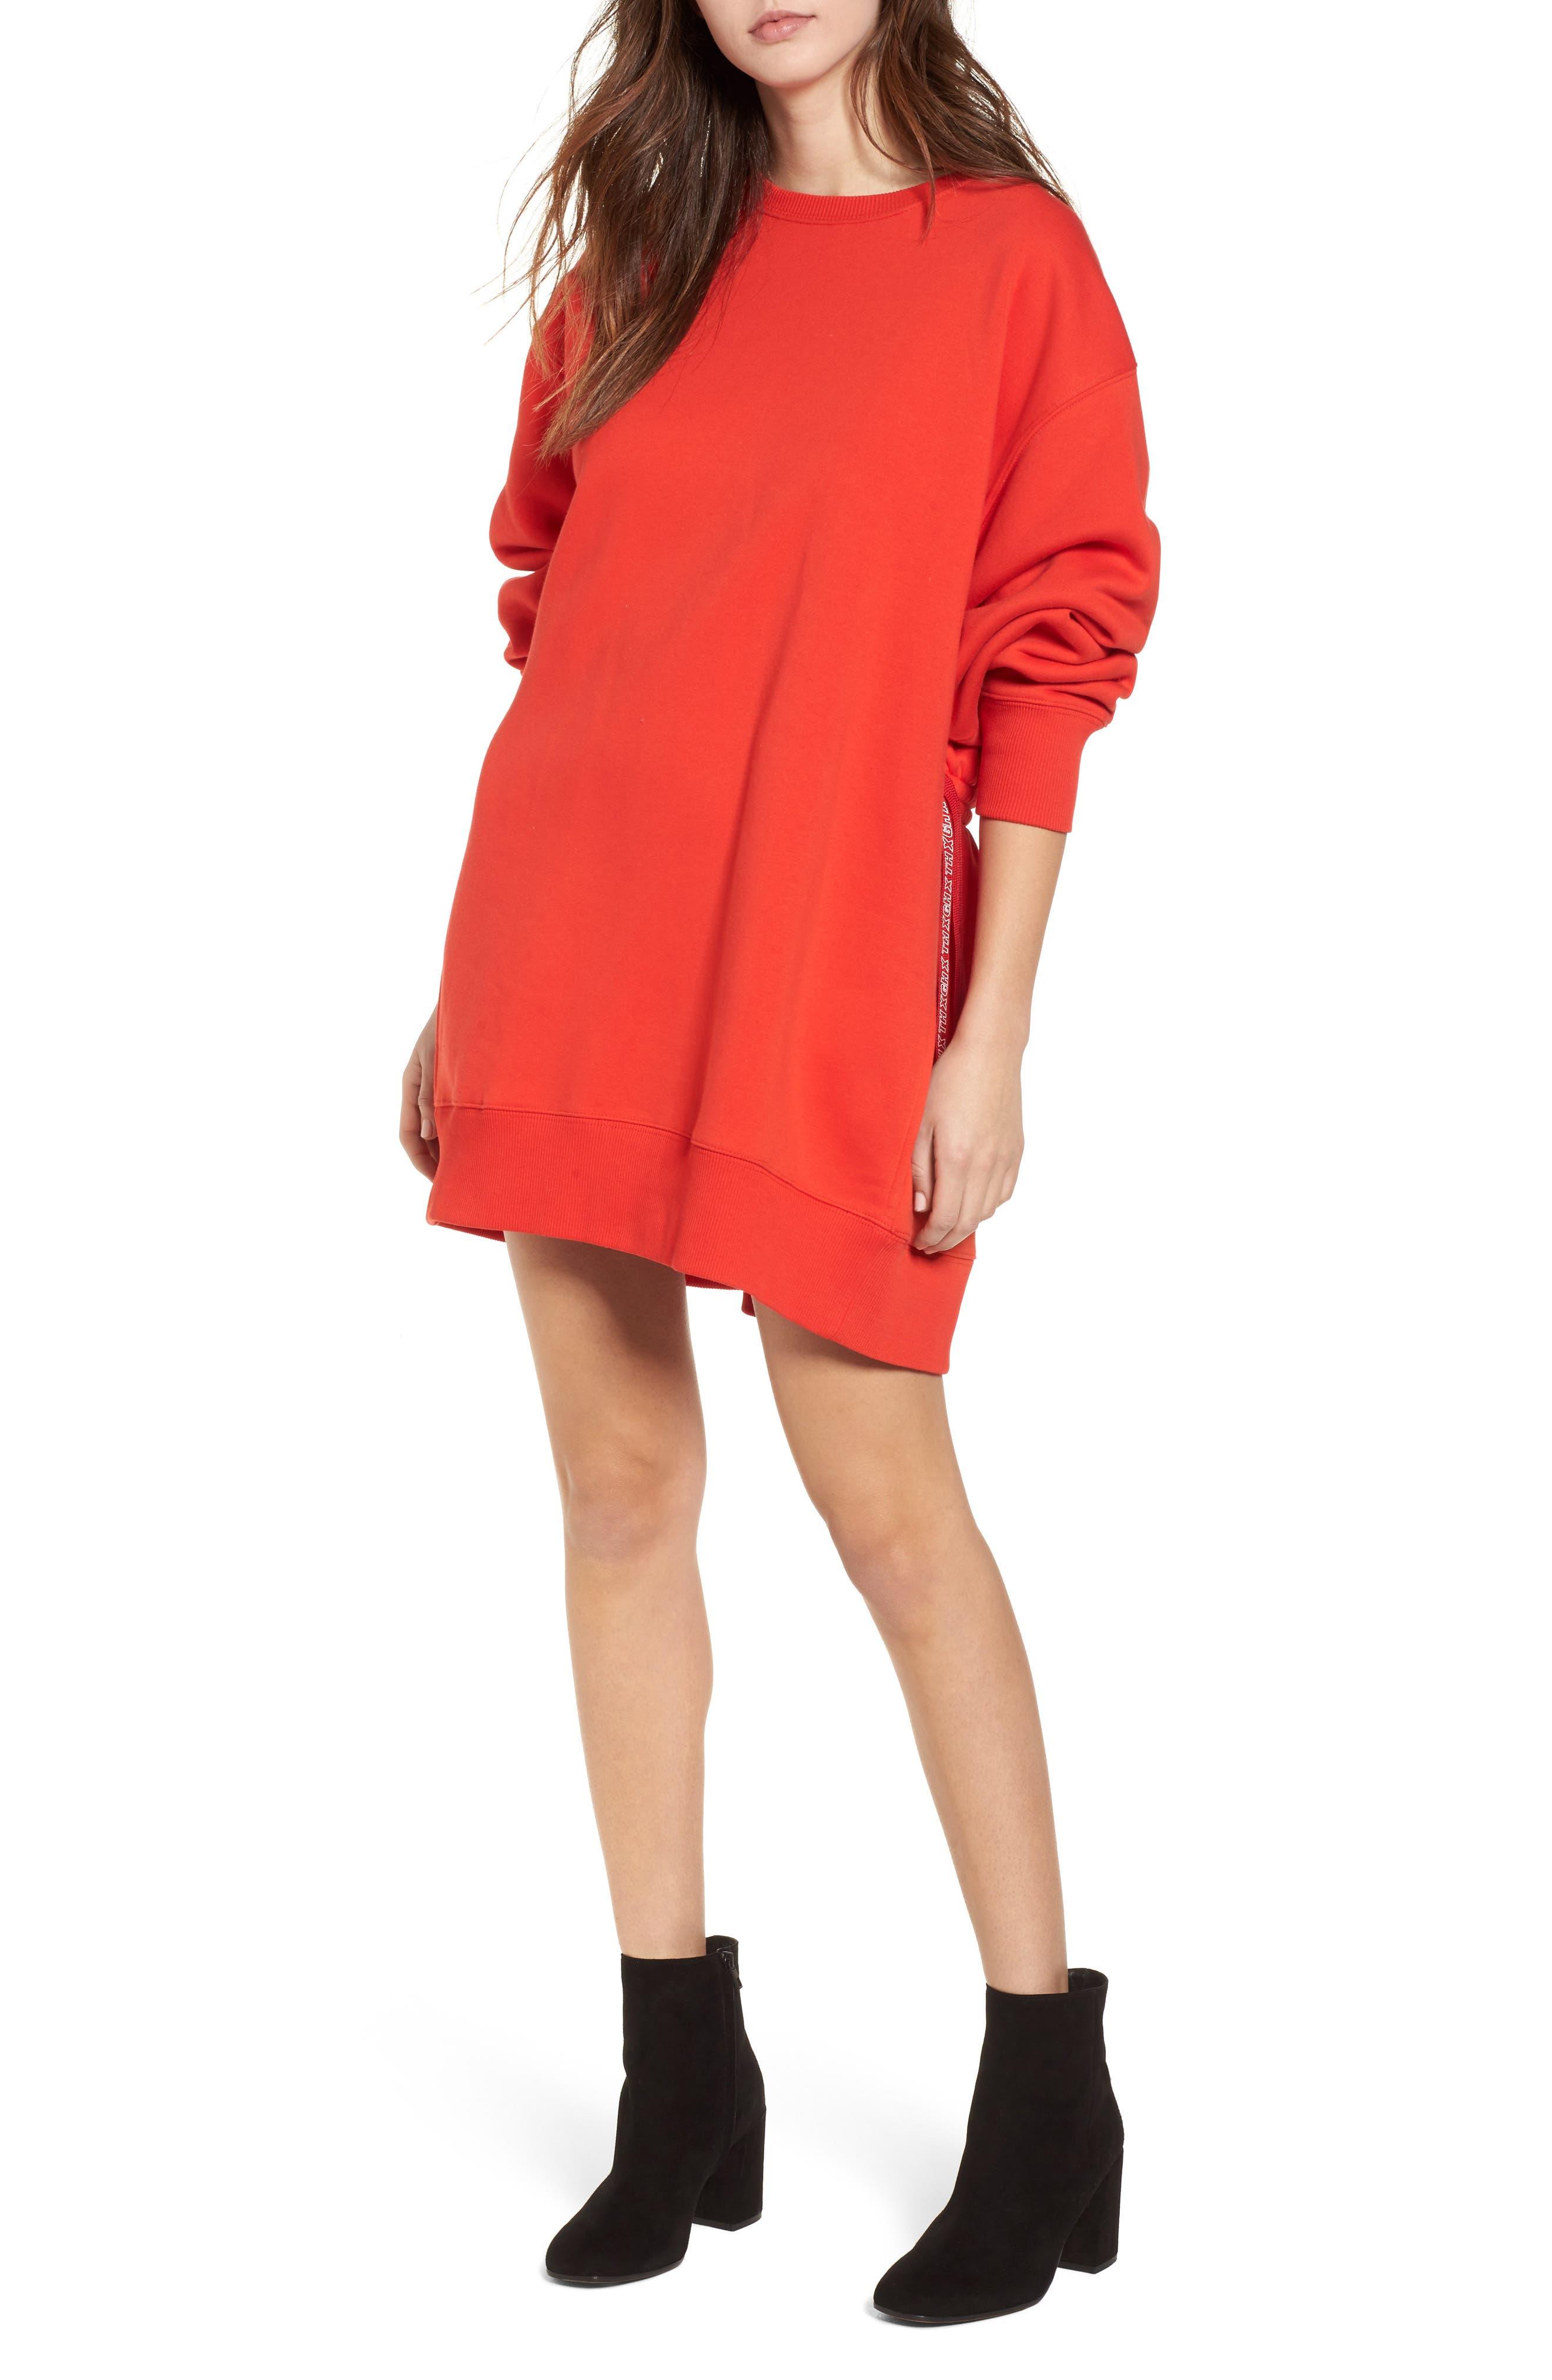 x Gigi Hadid Sweatshirt Dress,                             Main thumbnail 1, color,                             Flame Scarlet